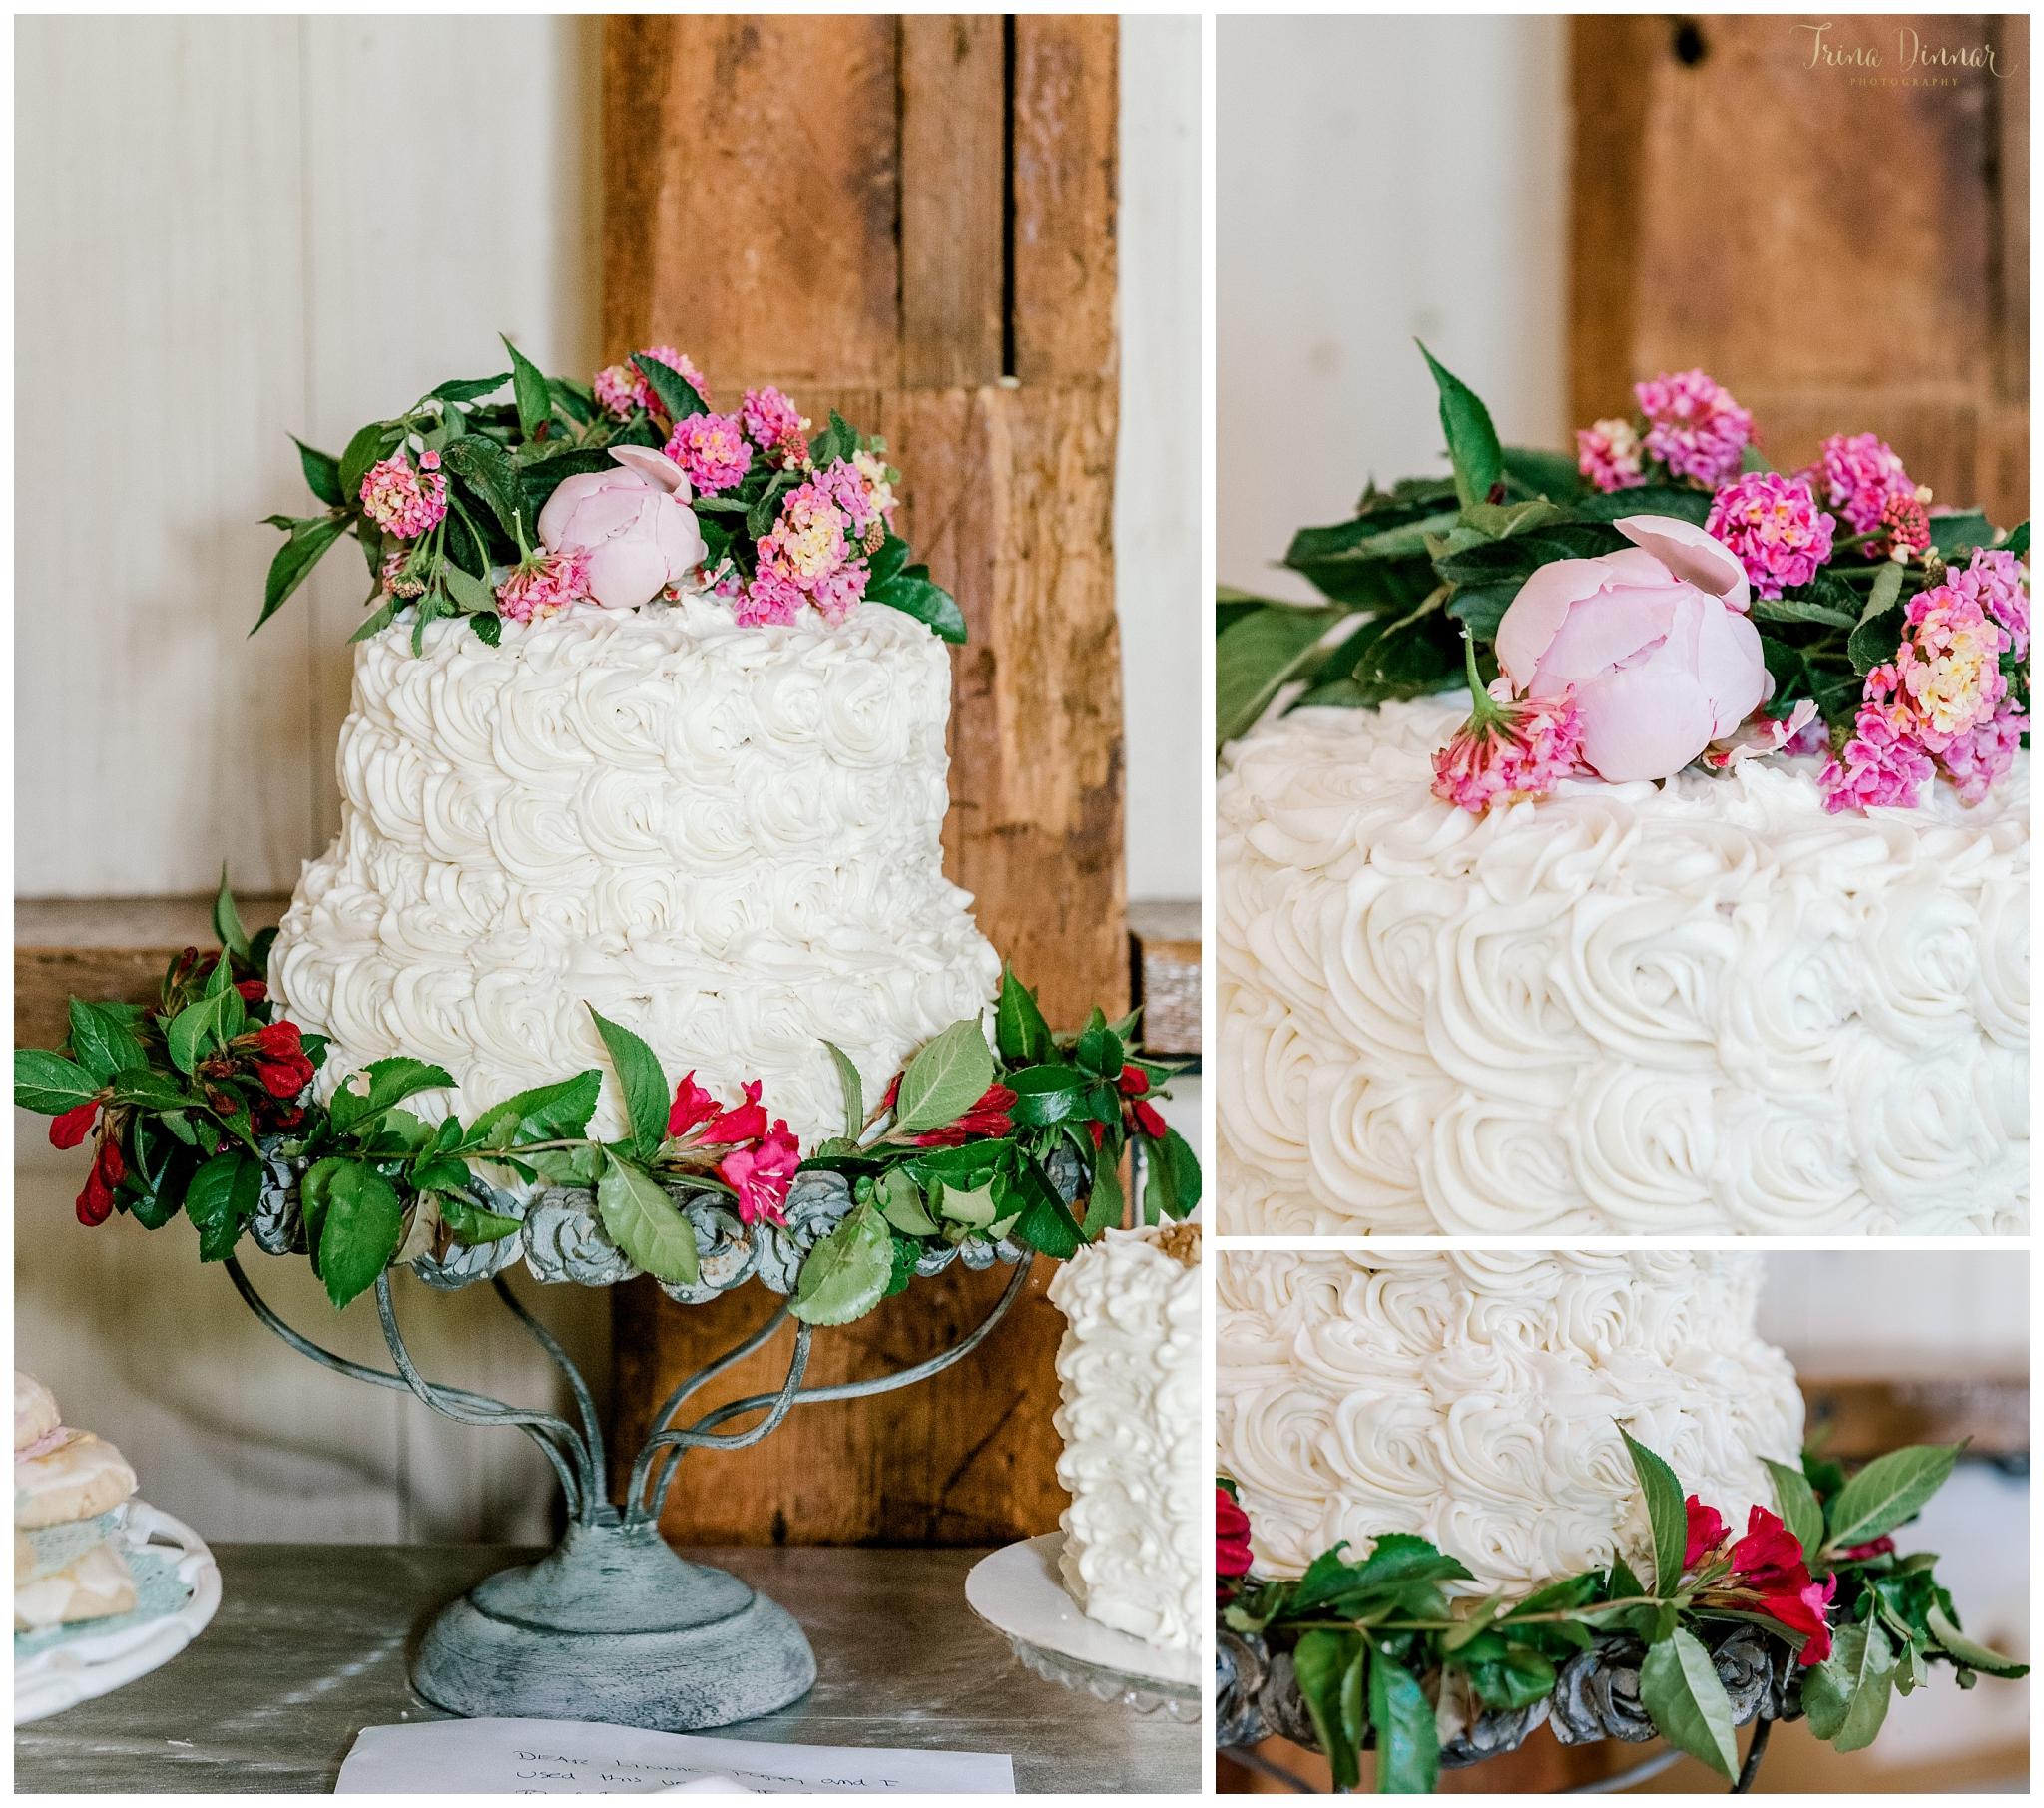 Rosalie Joy's Bakery Camden Maine Wedding Cake